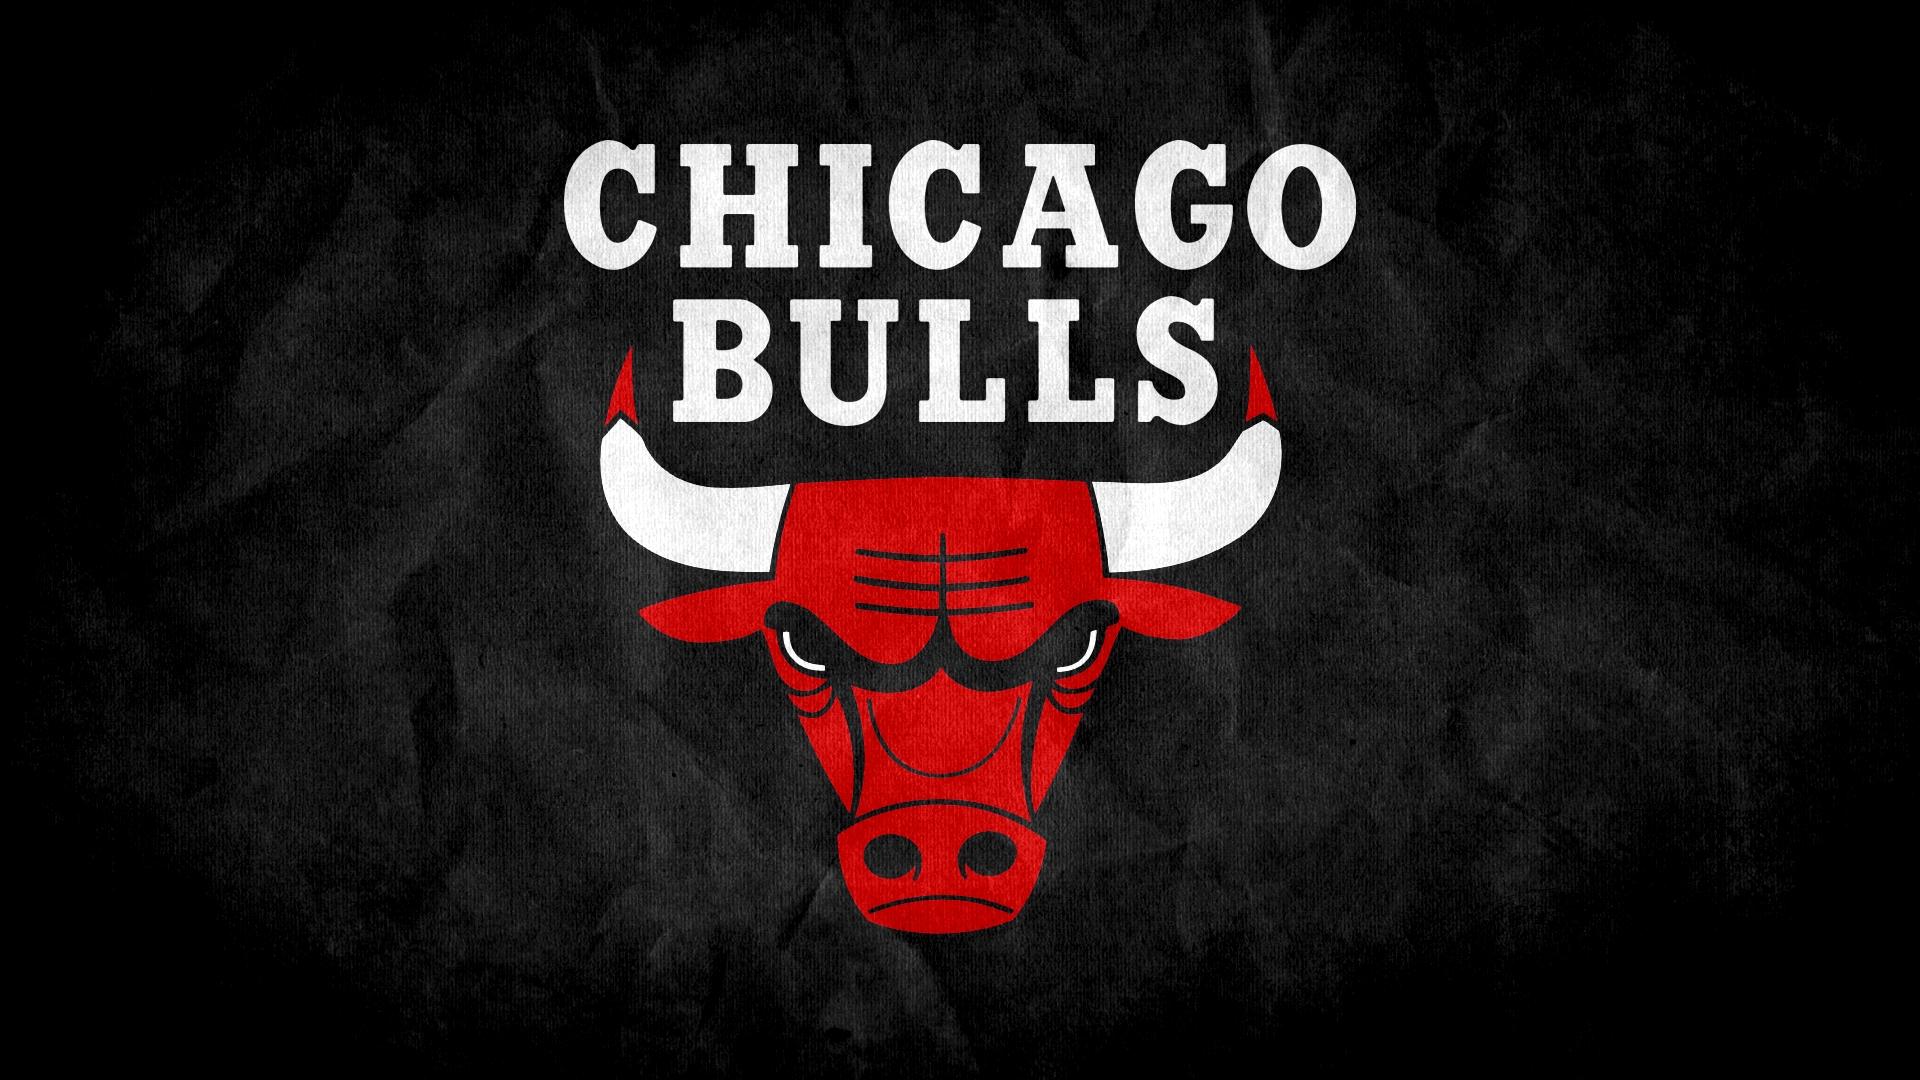 Free Download Download Wallpaper 1920x1080 Chicago Bulls 2015 Logo Full Hd 1080p 1920x1080 For Your Desktop Mobile Tablet Explore 49 Chicago Bulls Wallpaper 2015 Chicago Bulls Logo Wallpaper Chicago